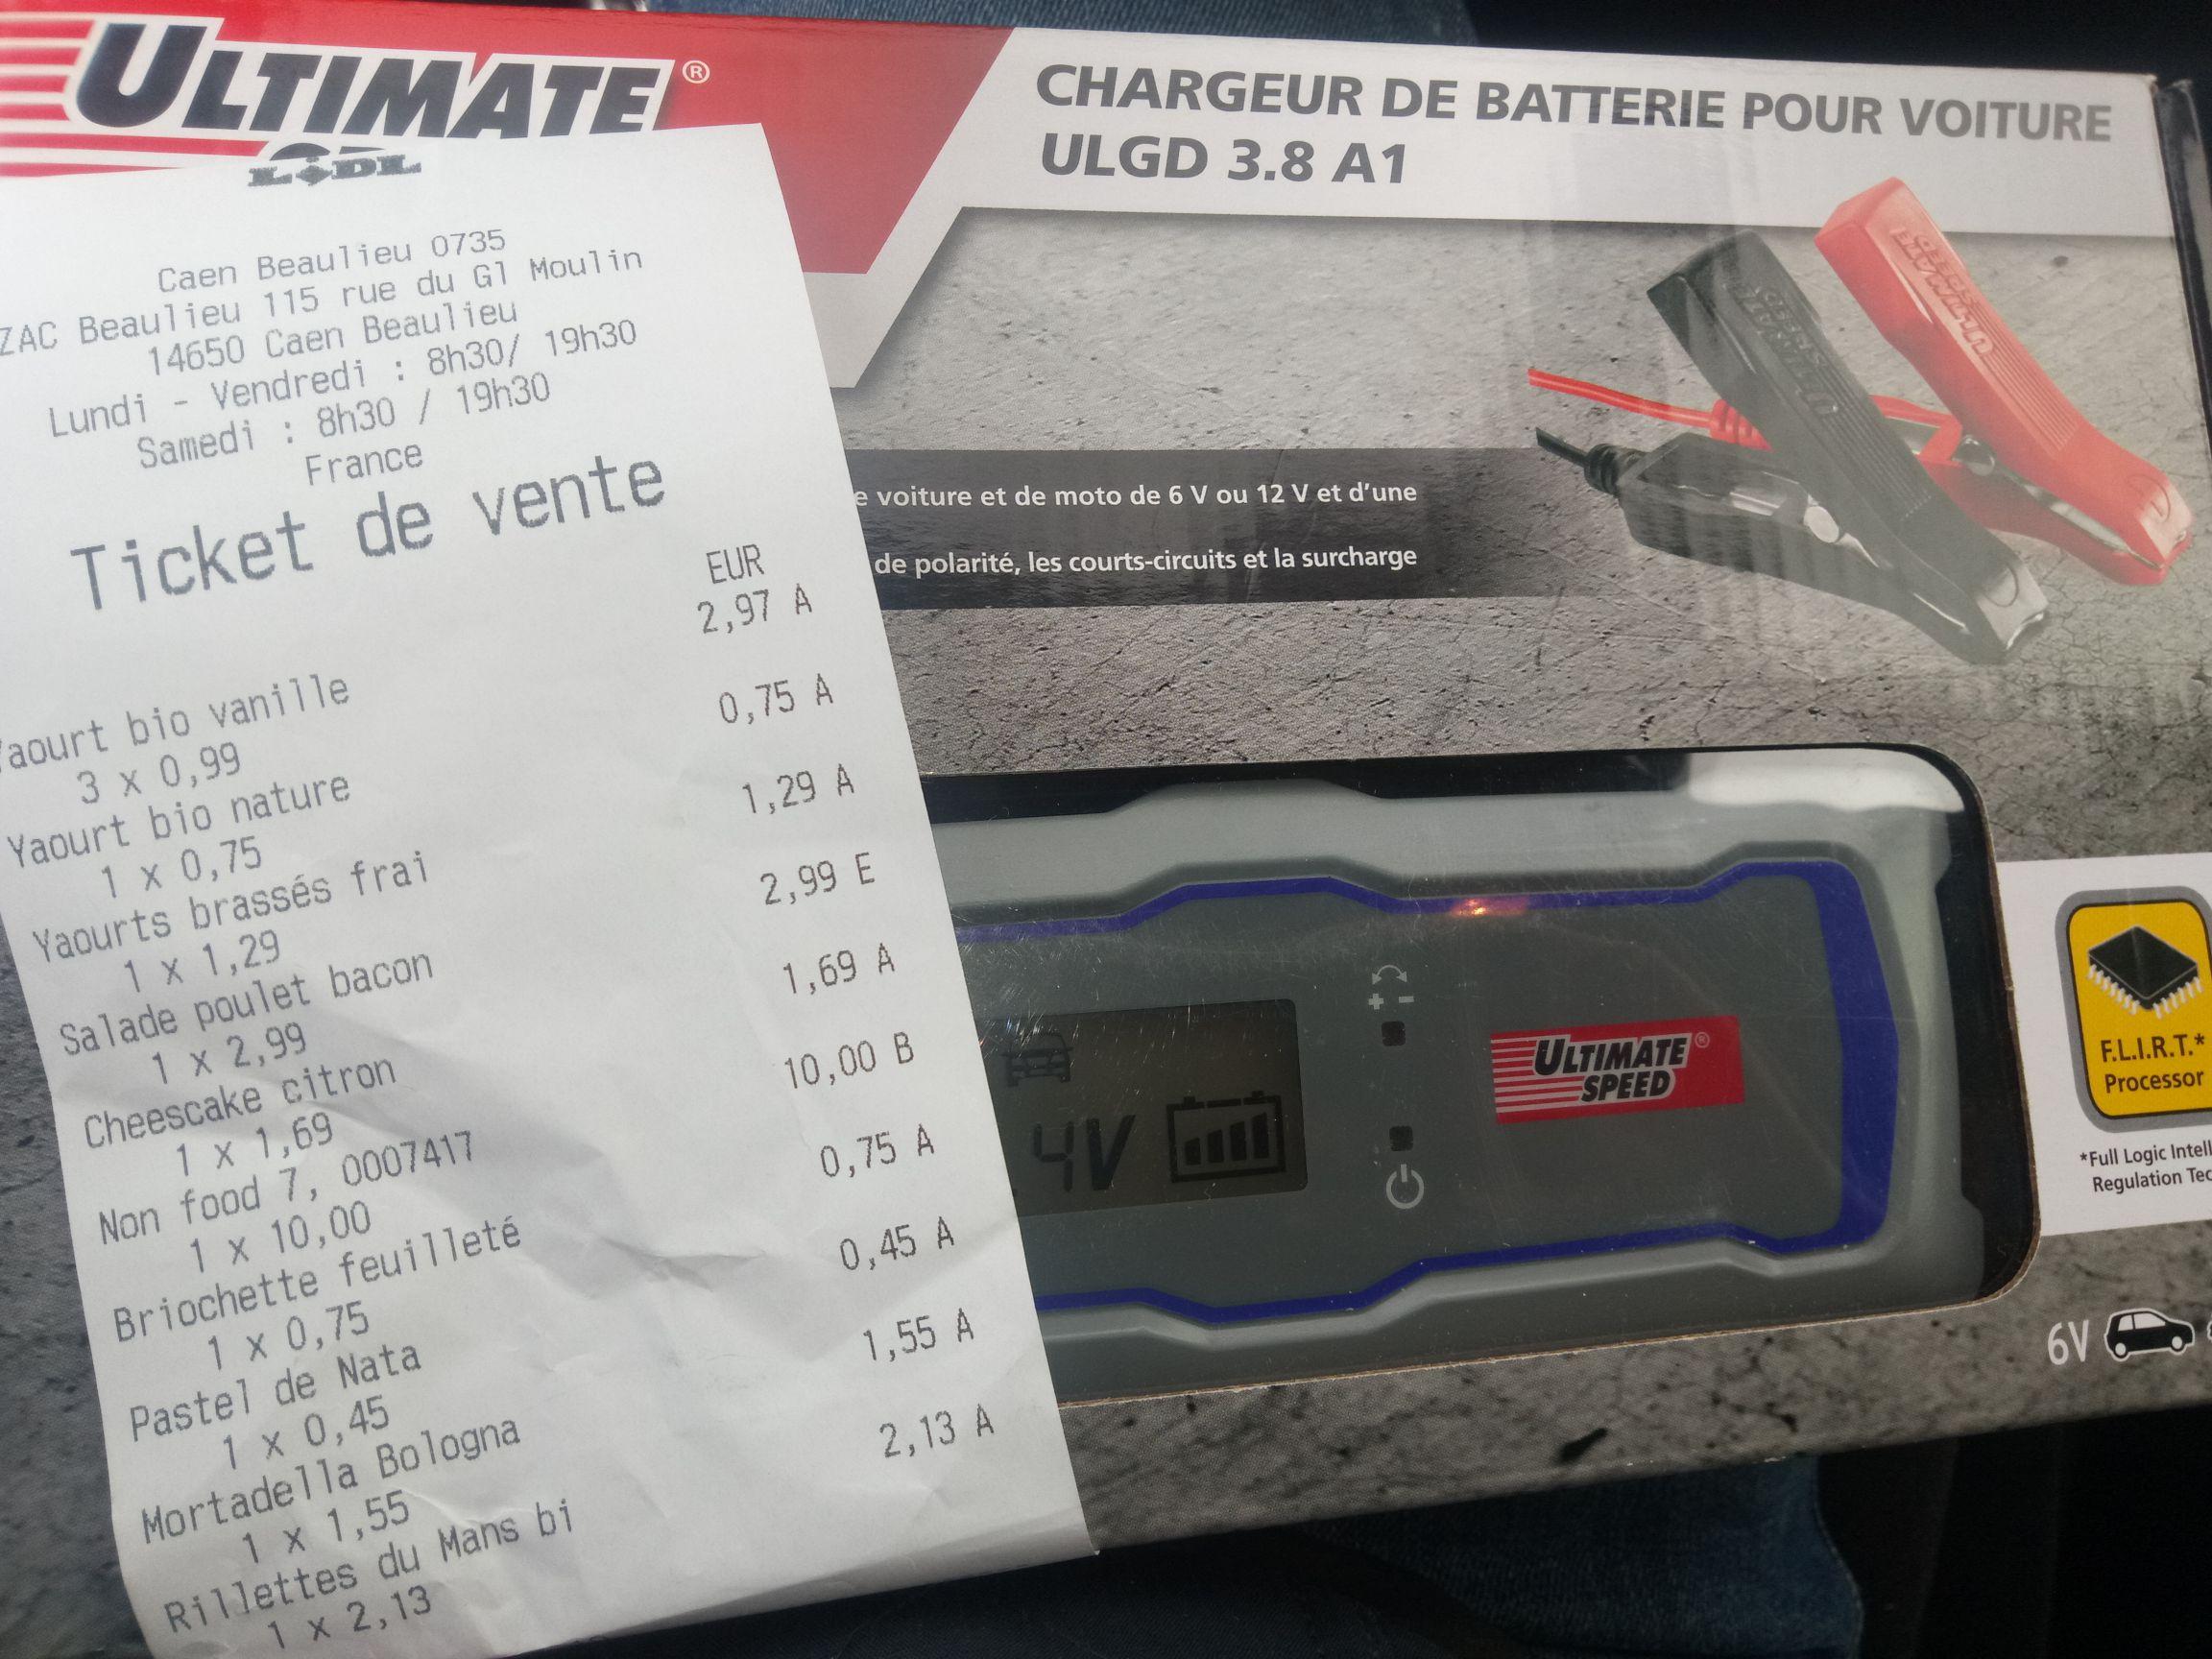 chargeur automatique batterie voiture ultimate speed lidl caen 14. Black Bedroom Furniture Sets. Home Design Ideas